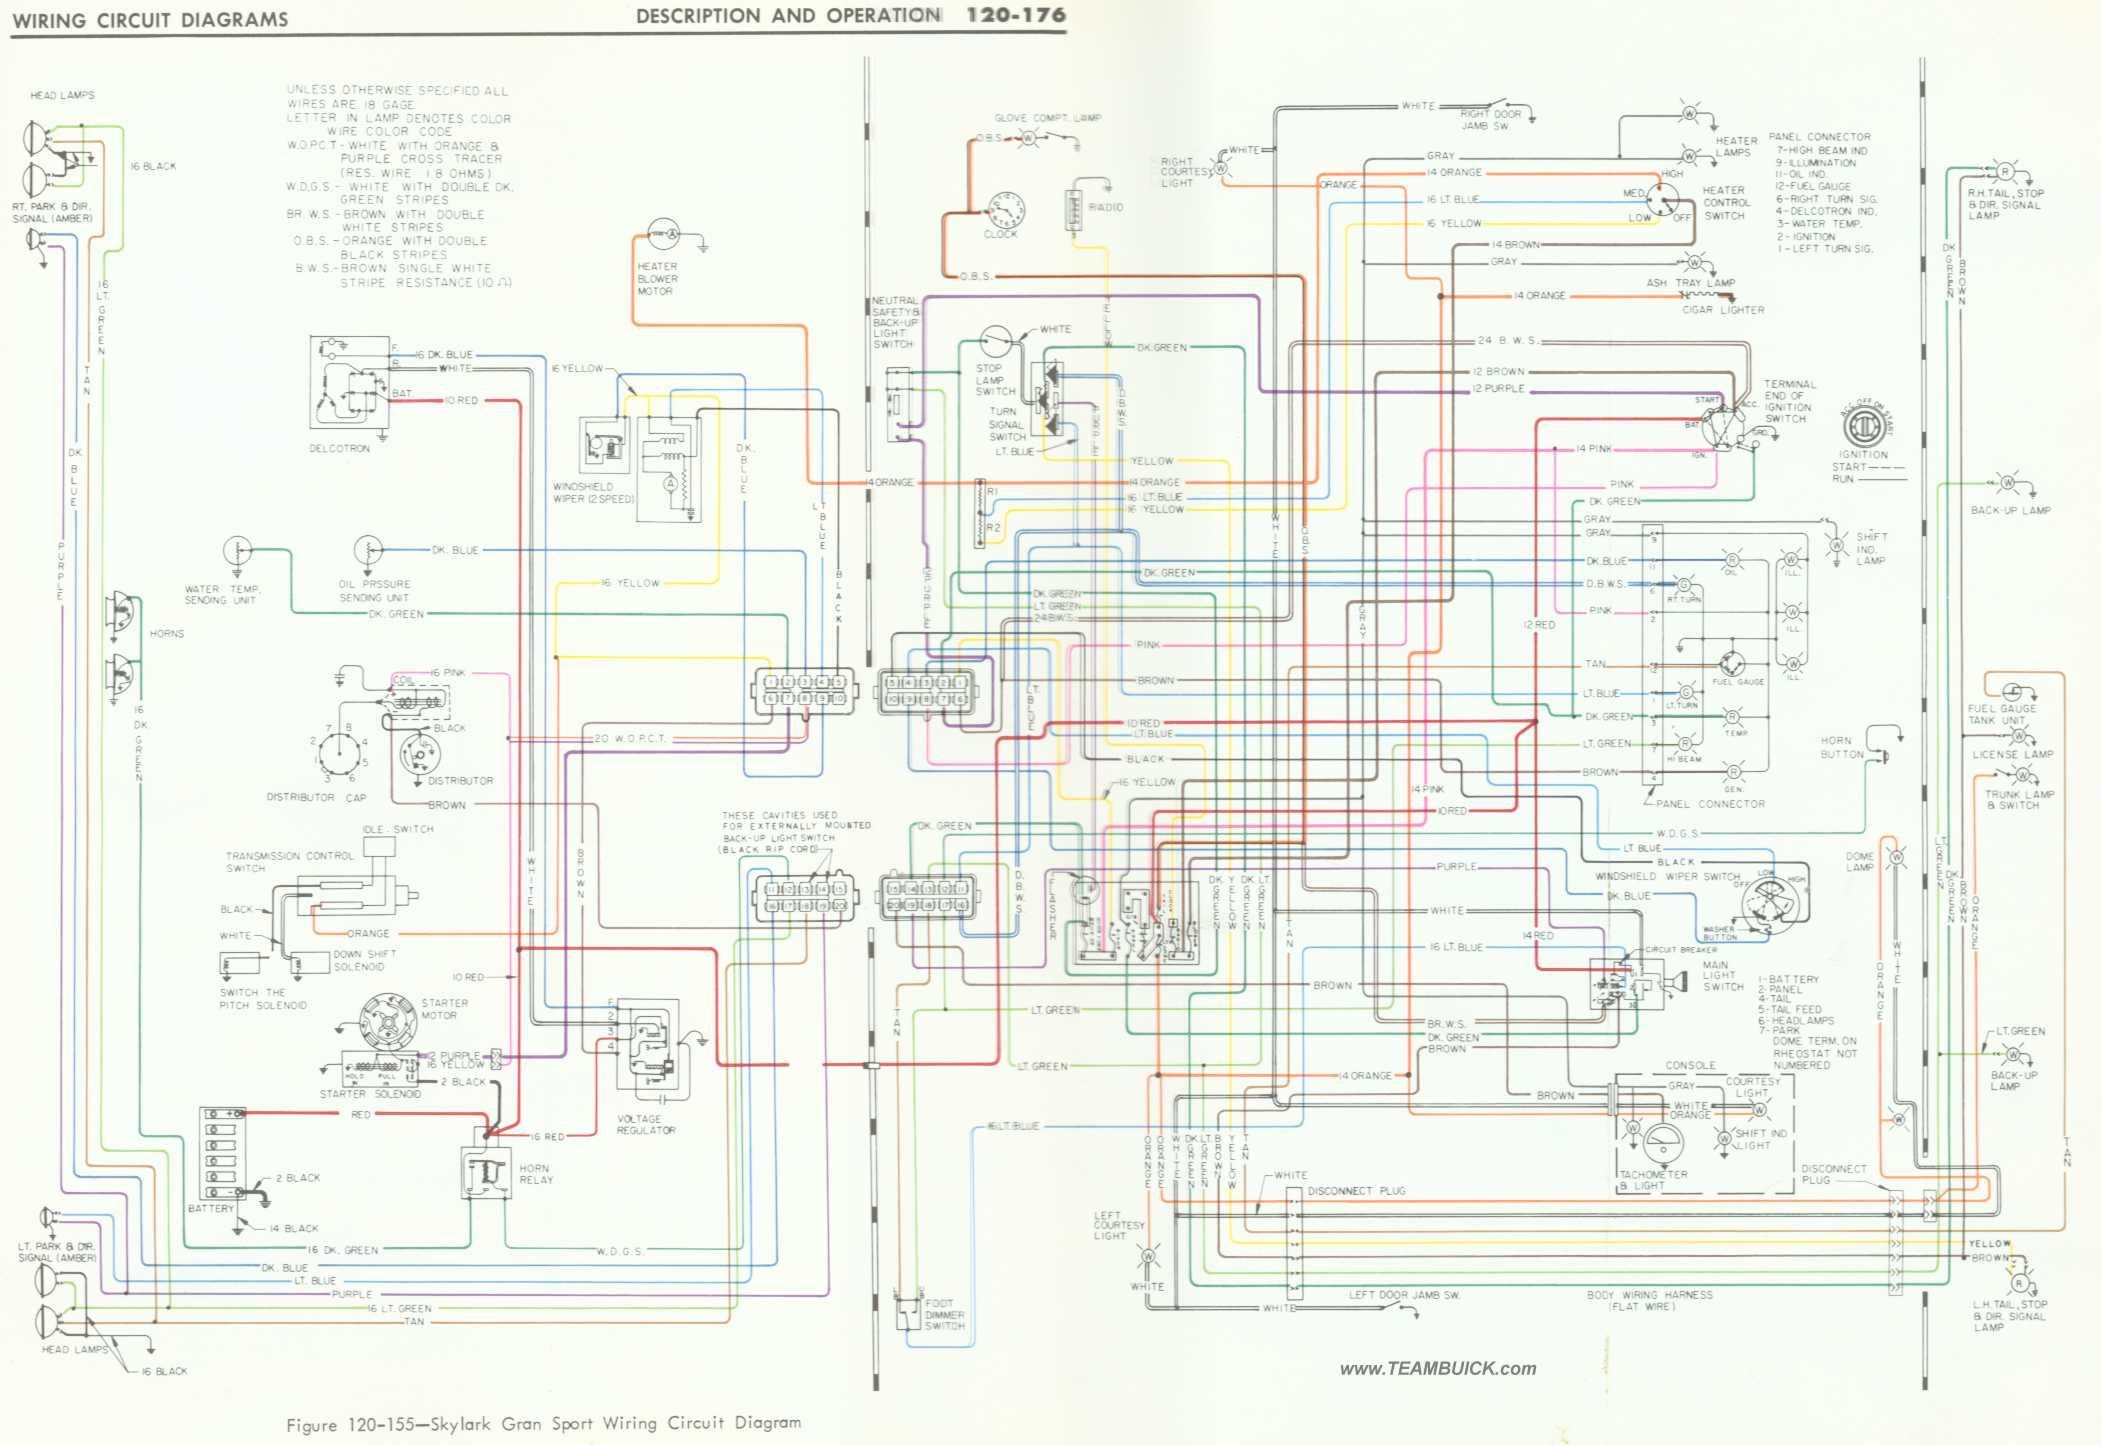 wiring diagram for skylark diagram for fuel wiring diagram 68 Buick 71 Buick